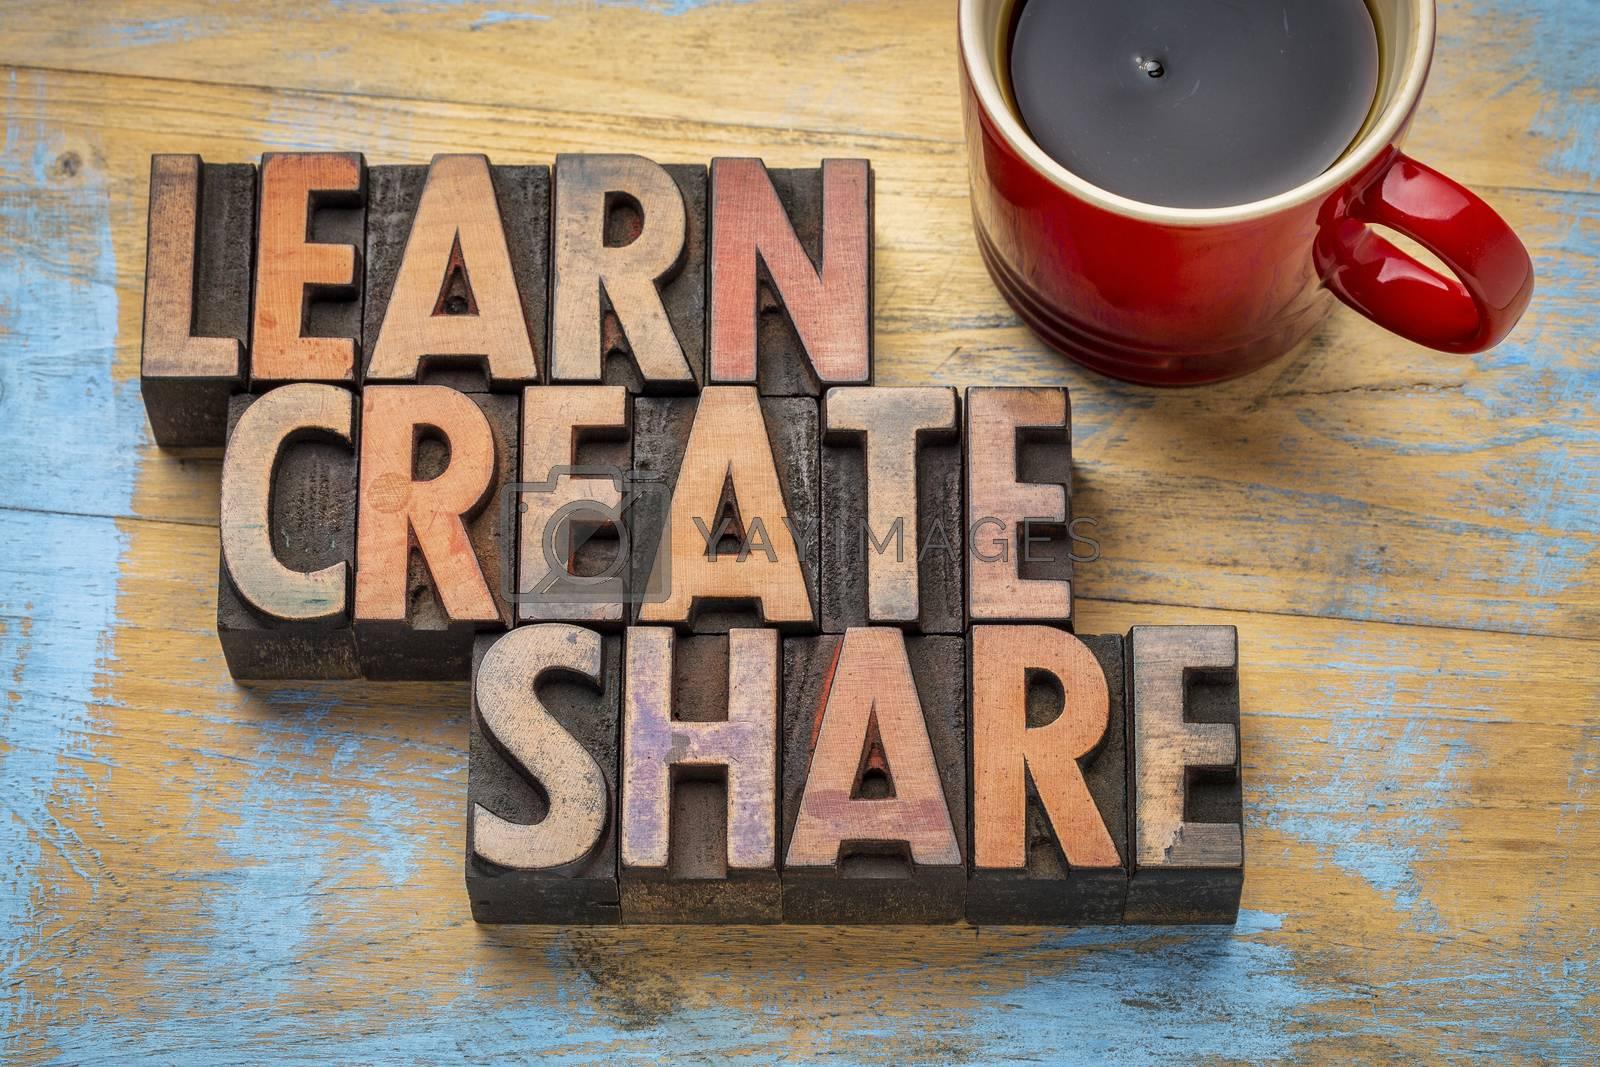 learn, create, share in wood type by PixelsAway